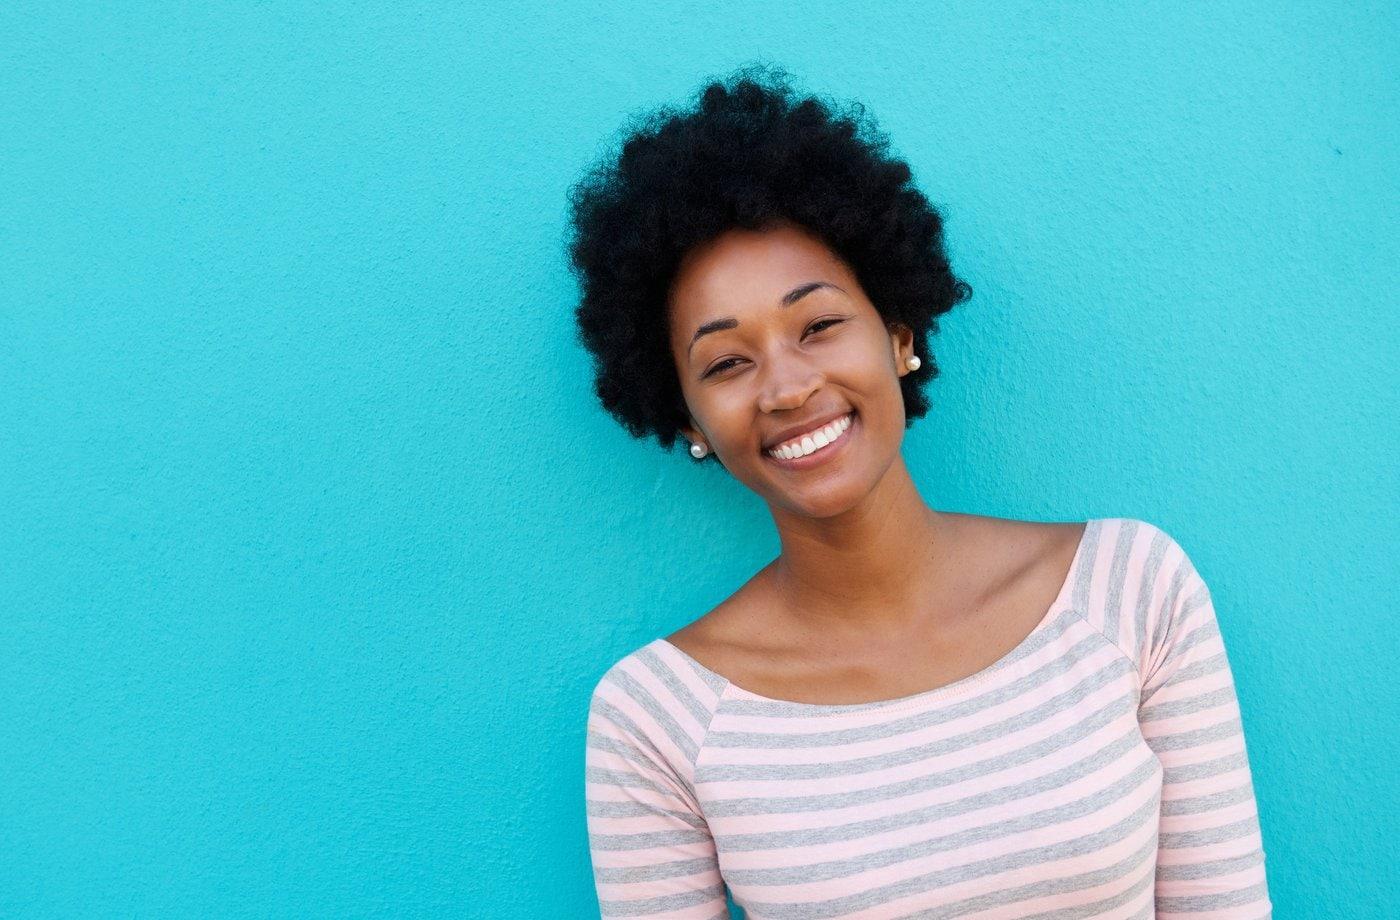 Pretty smiling woman standing against aqua wall